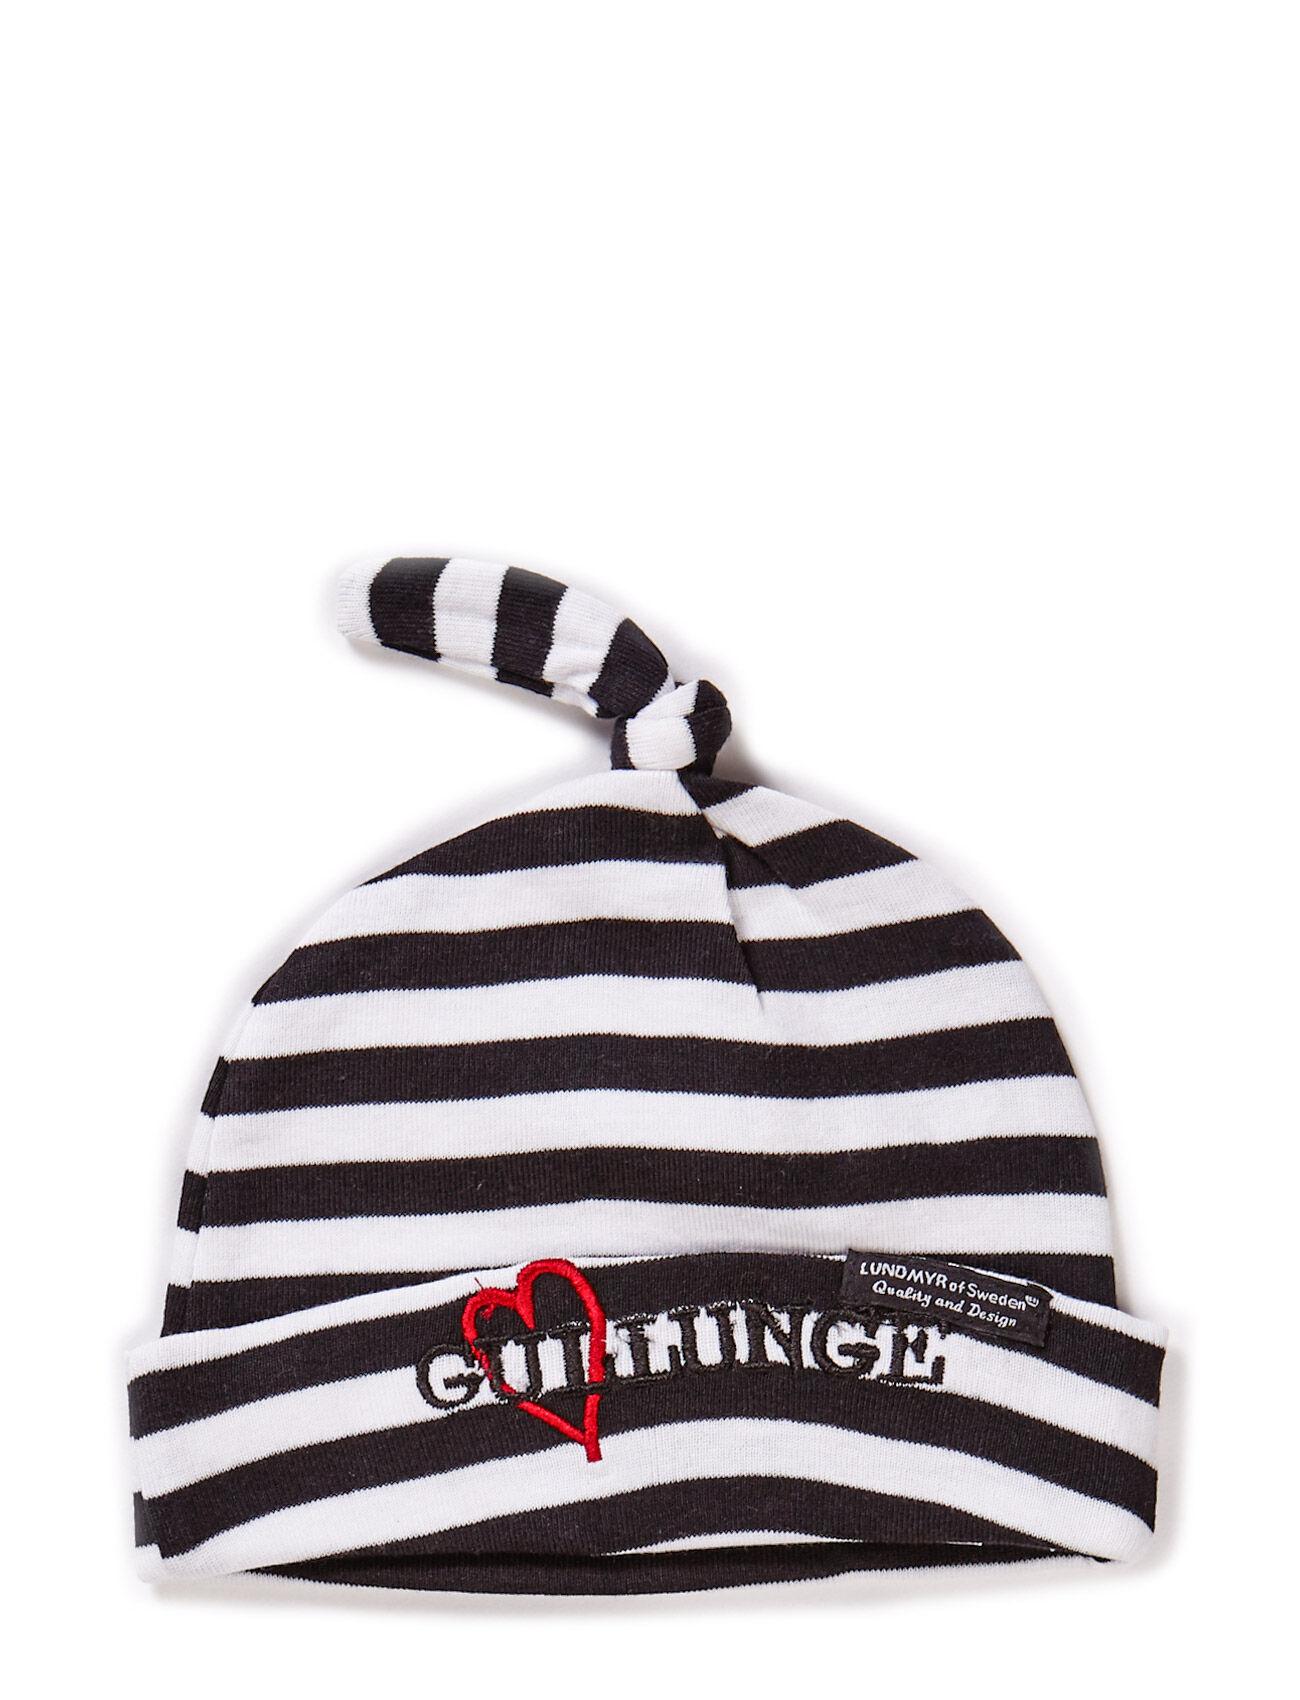 "Lundmyr Cap, Striped, Ã""Lskling"